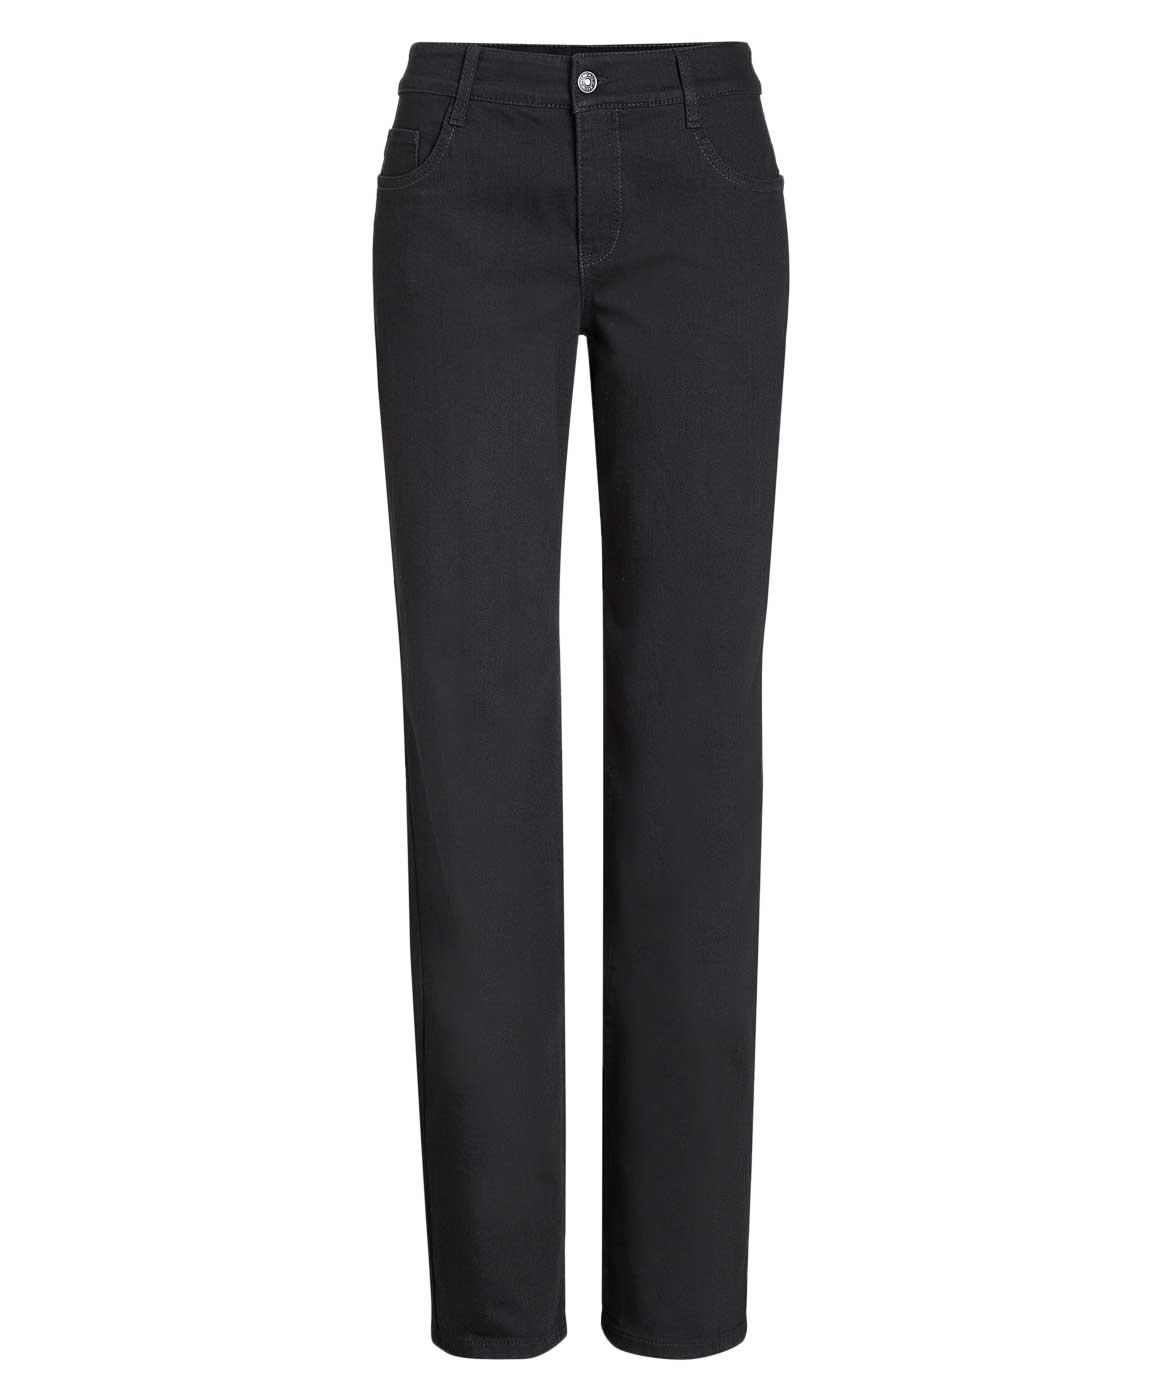 Mac Gracia Jeans - Feminine Fit - Black Black